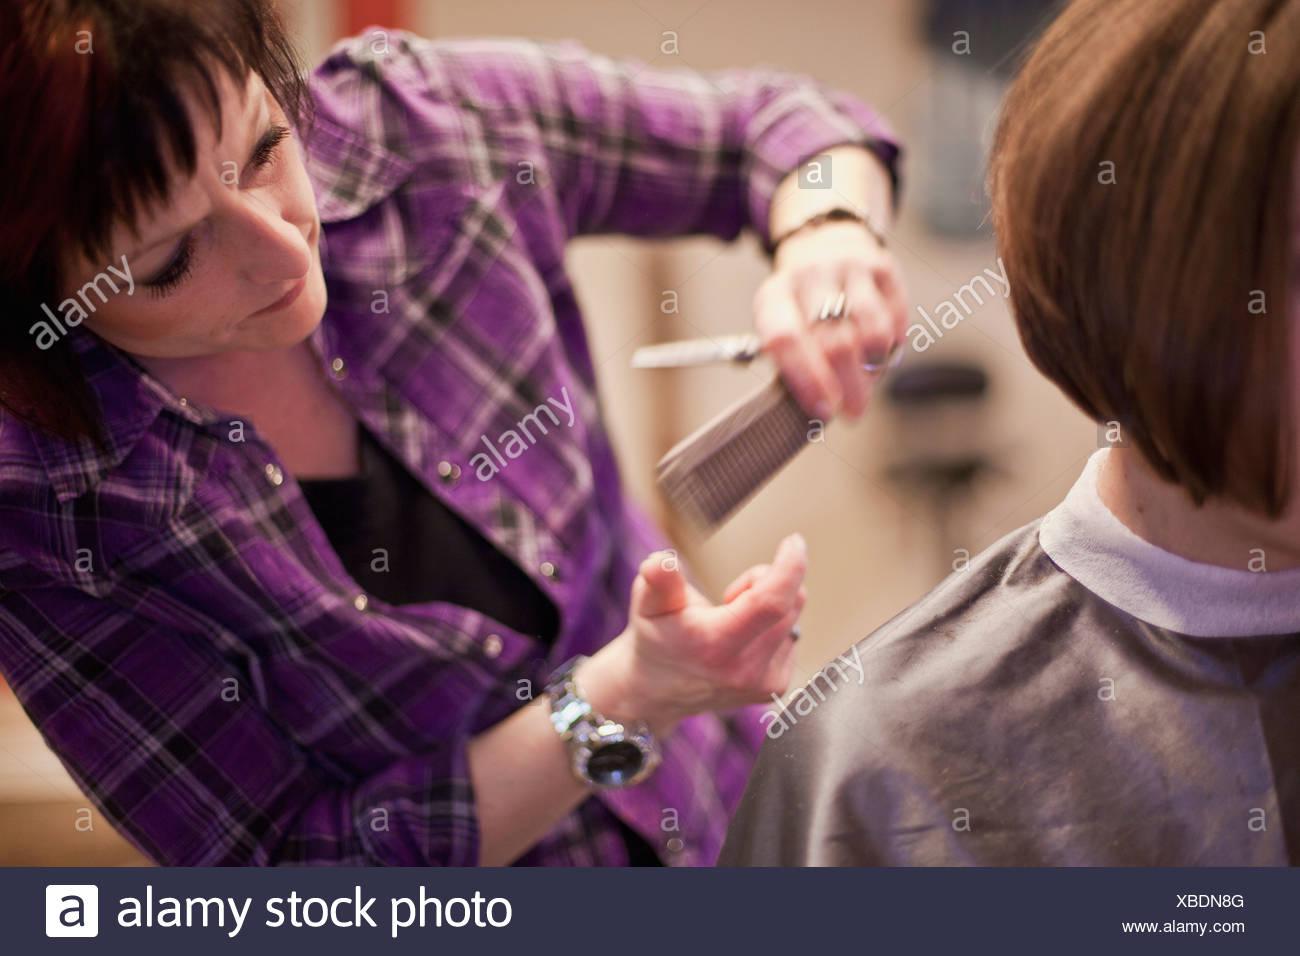 Woman cutting hair of customer - Stock Image